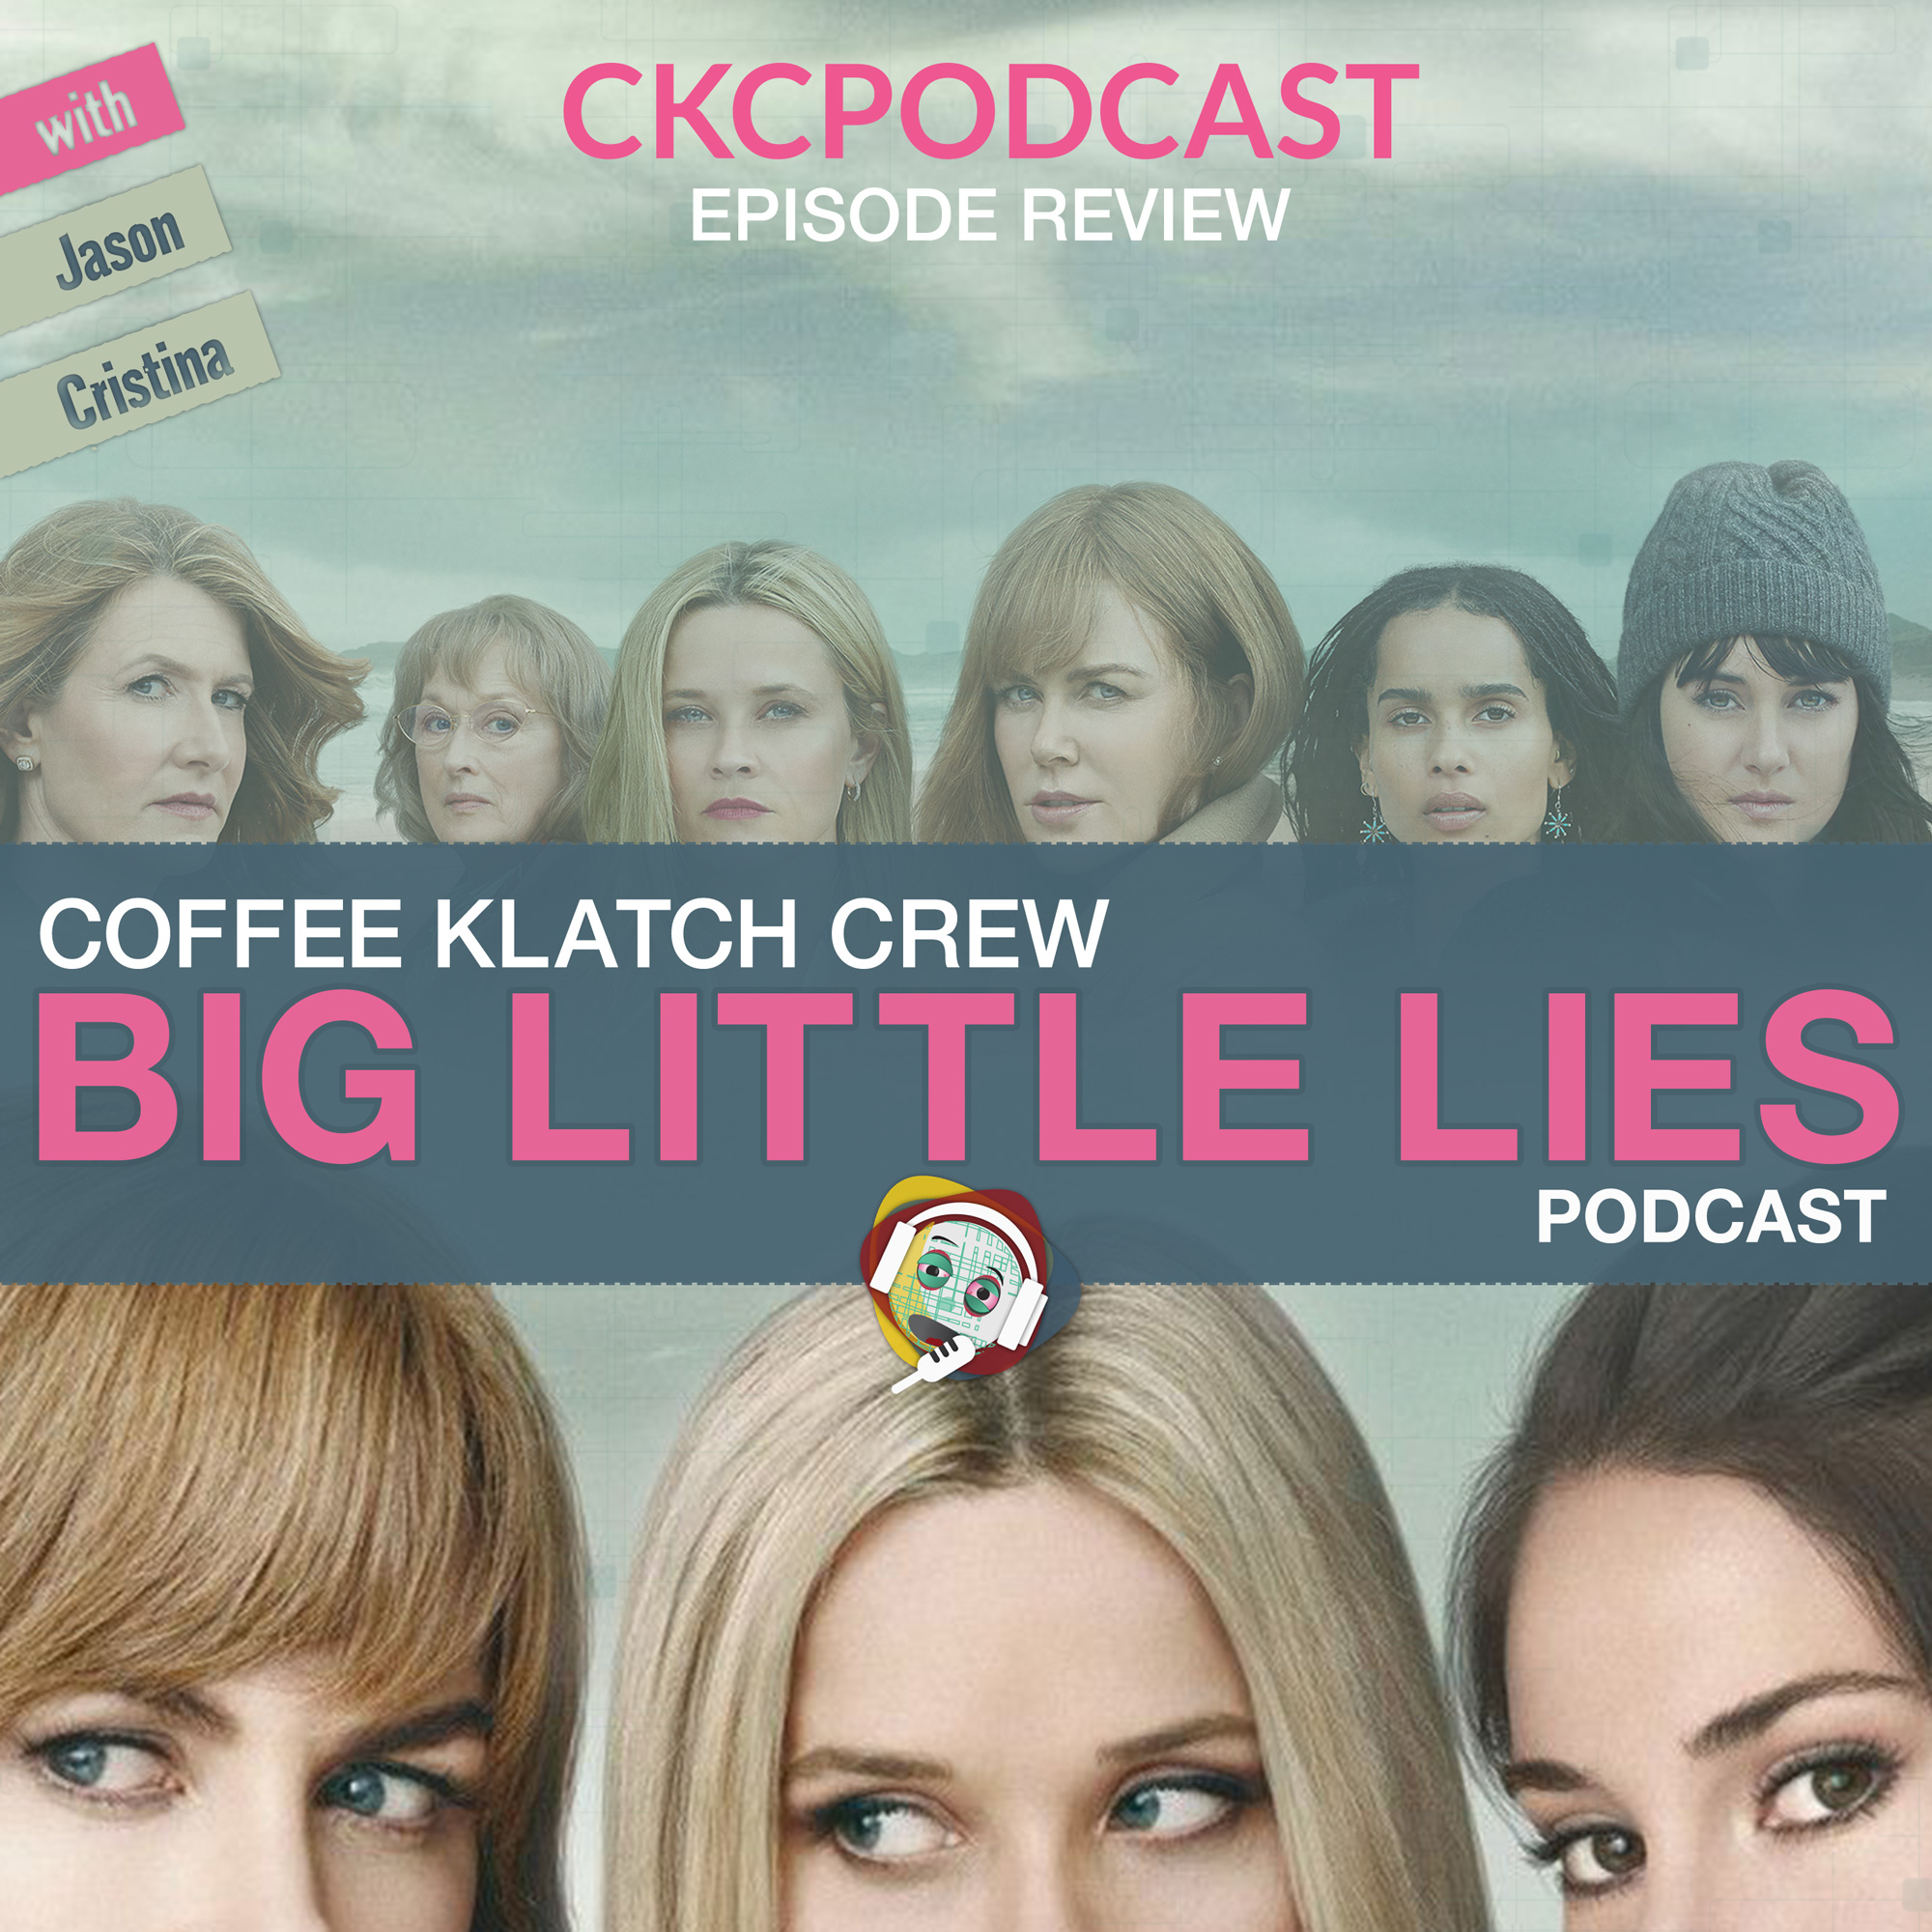 Big Little Lies Review | Listen via Stitcher for Podcasts